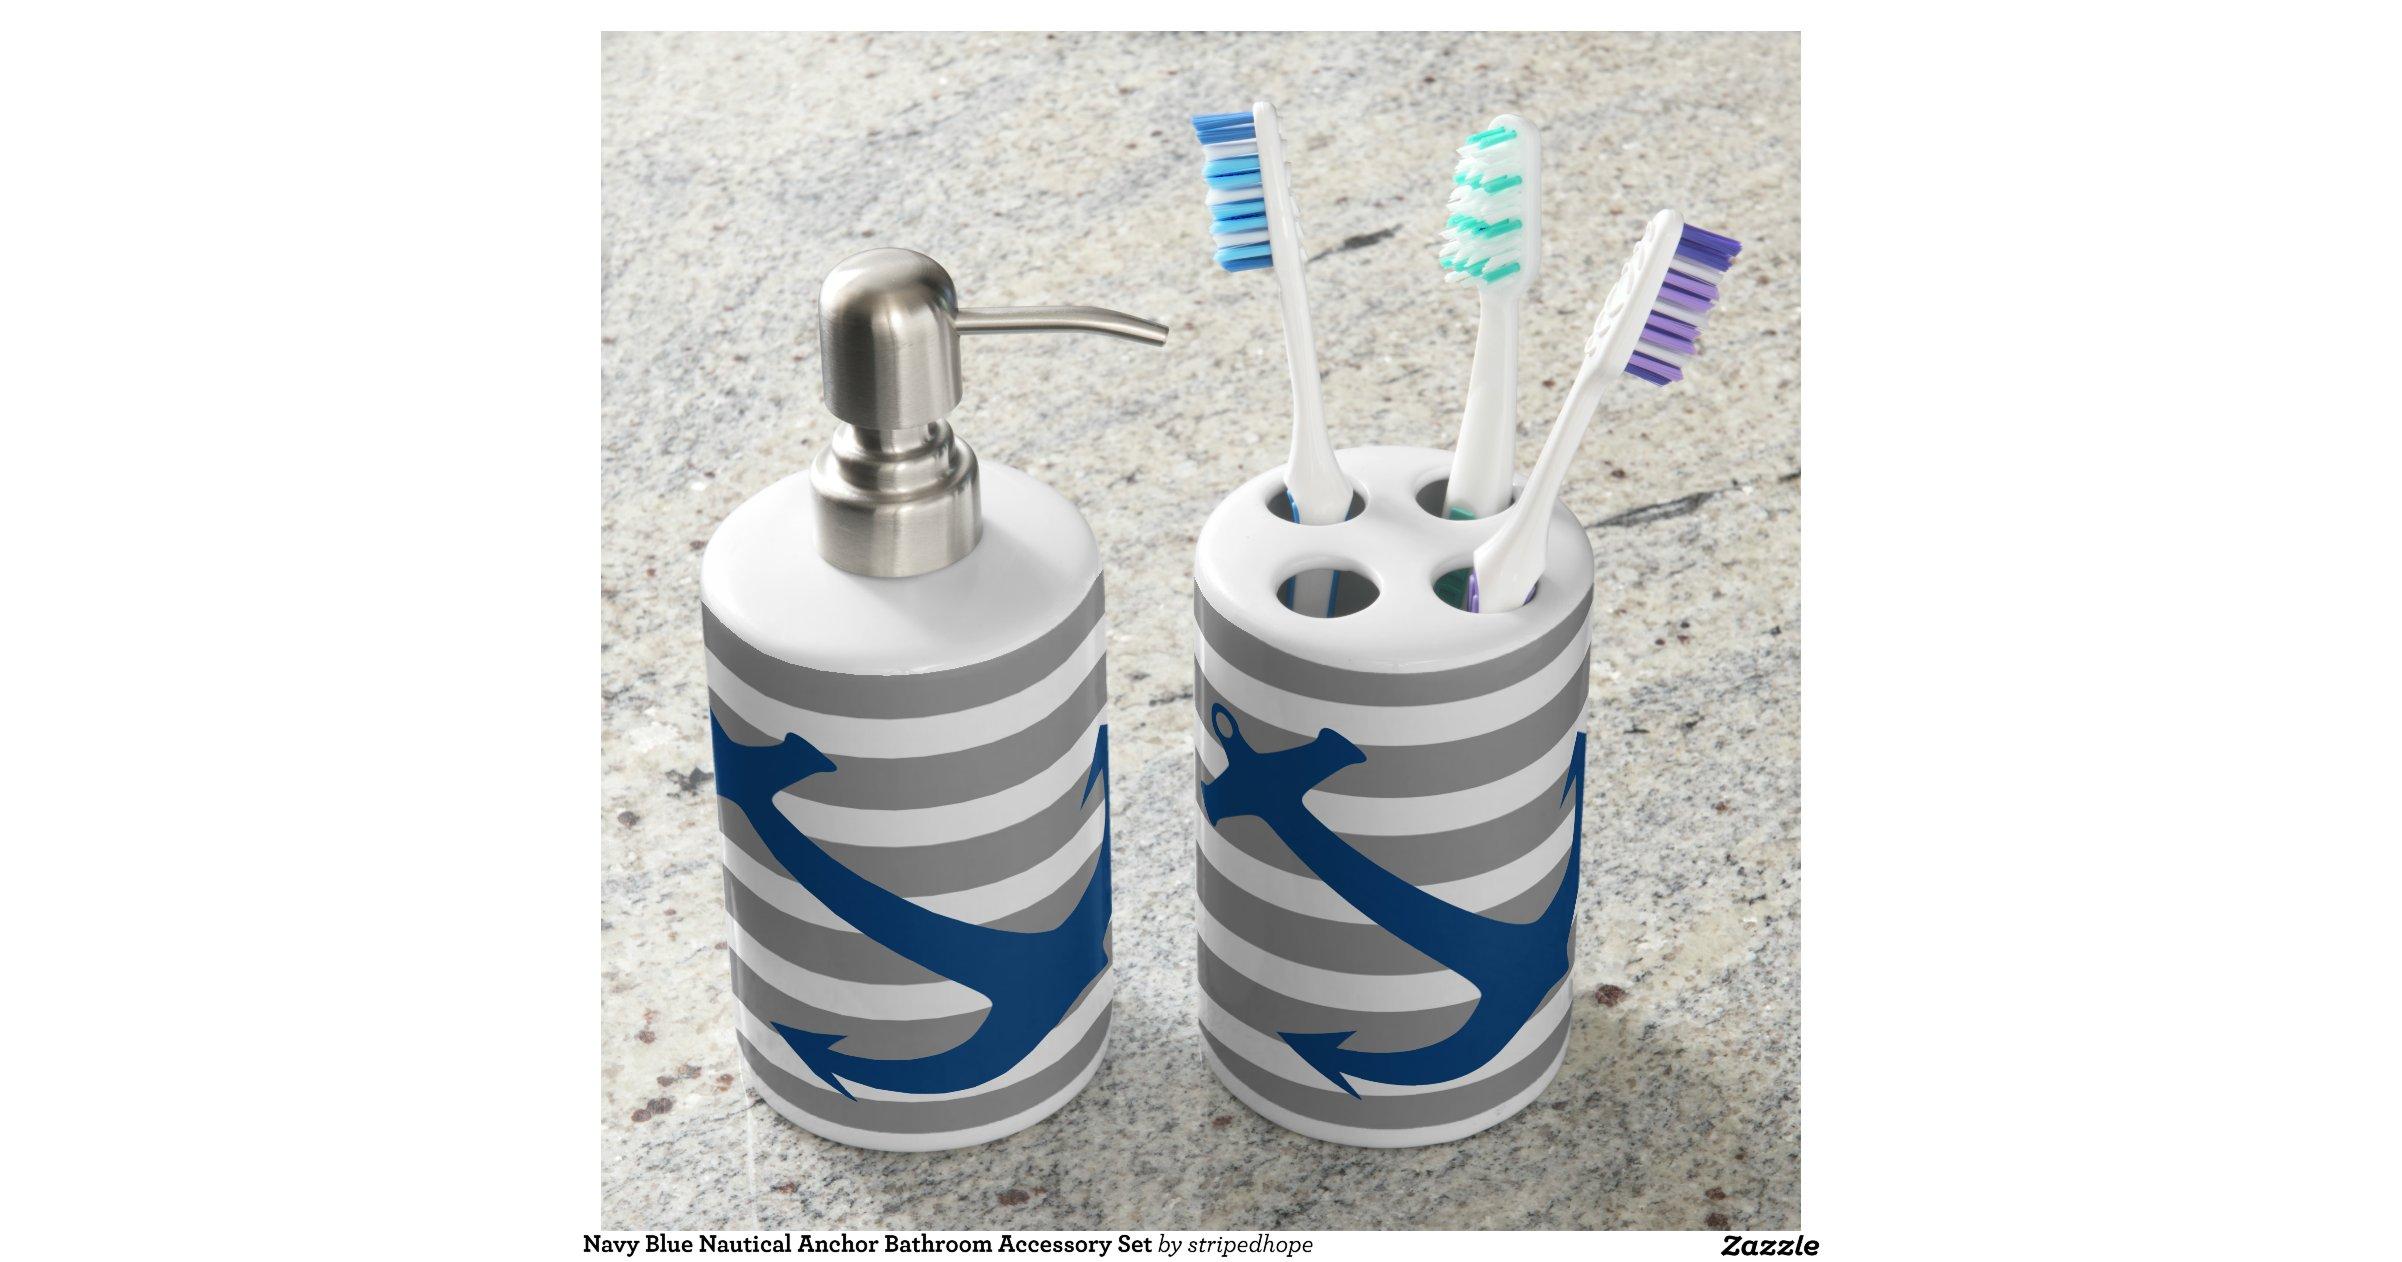 Navy Blue Nautical Anchor Bathroom Accessory Set Bath Sets